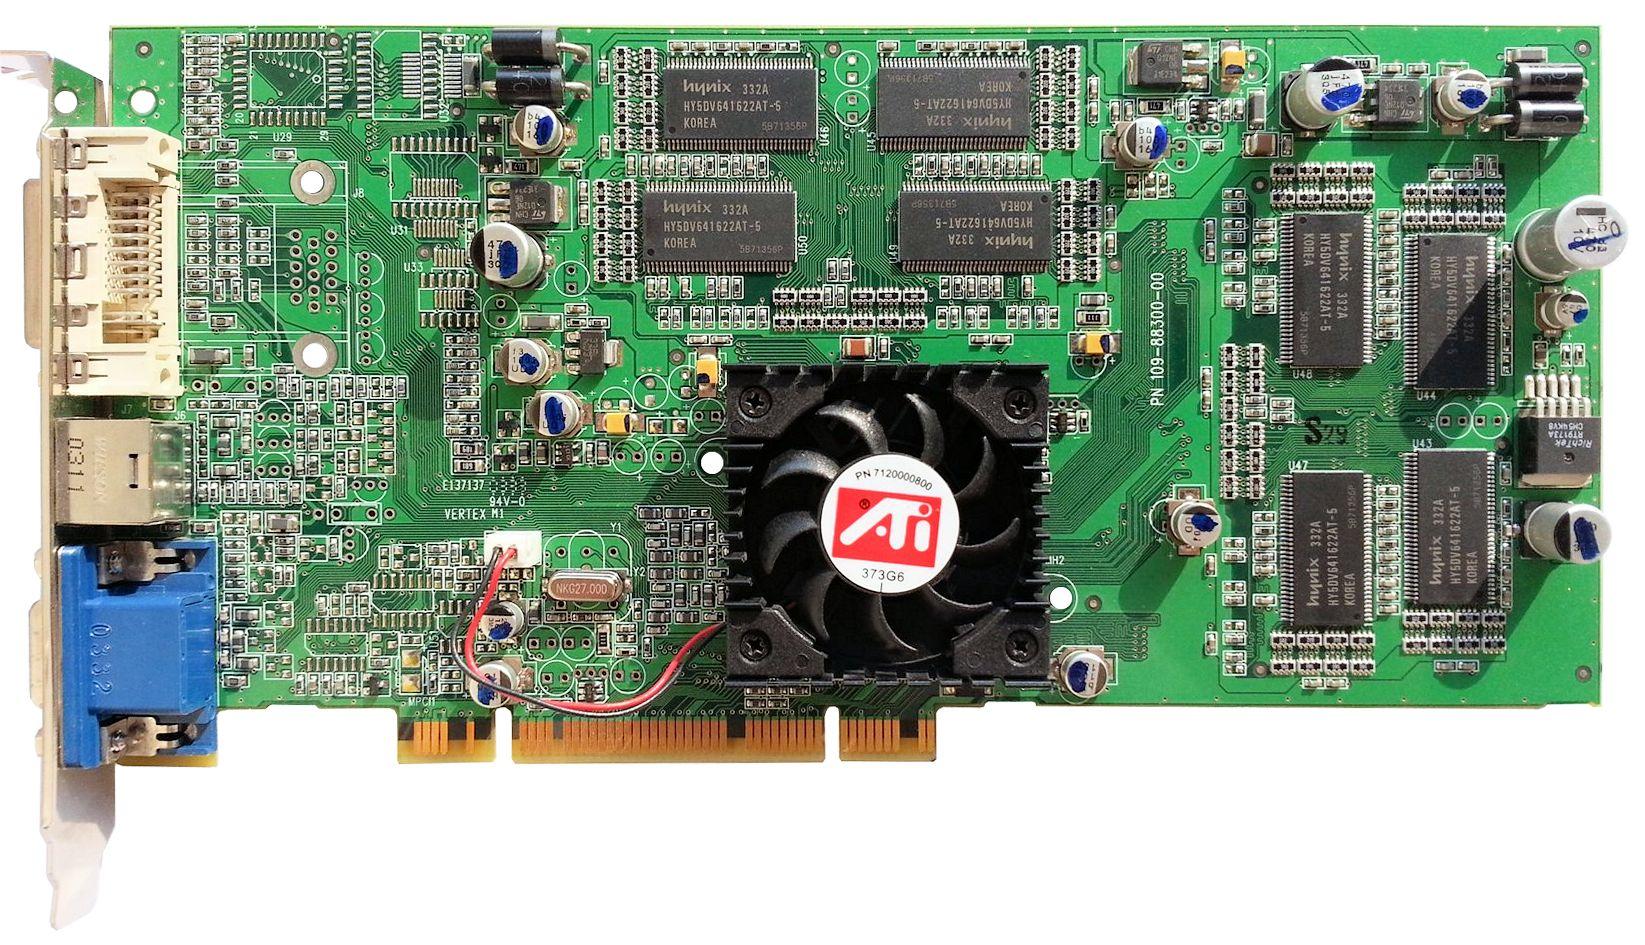 ATI 3DP All-in-Wonder Radeon 7500 Driver for Windows 7